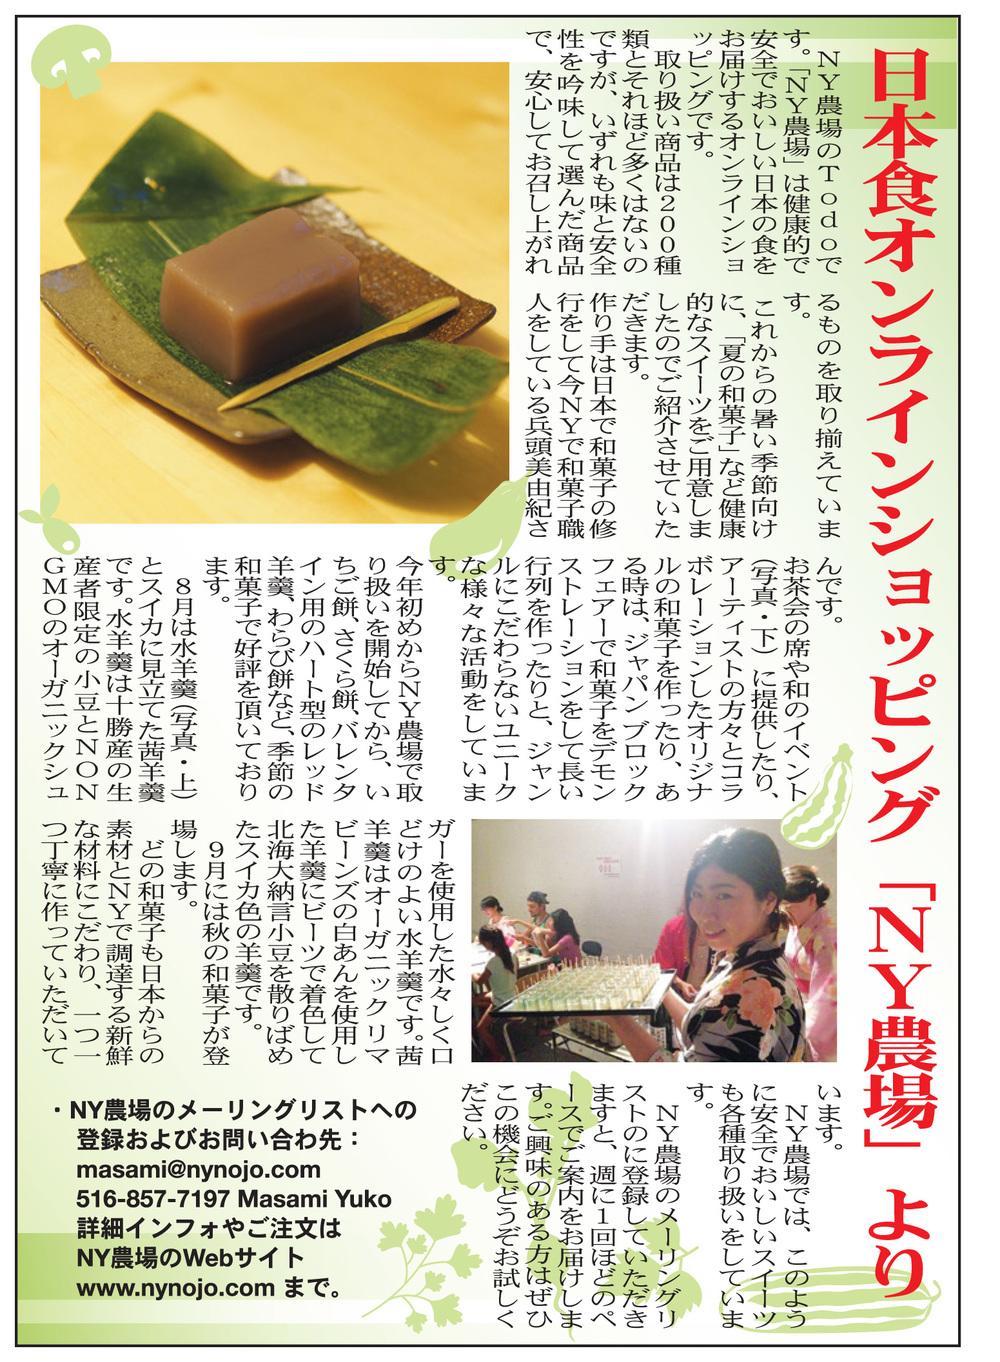 NYnojo080115 Wagashi.jpg